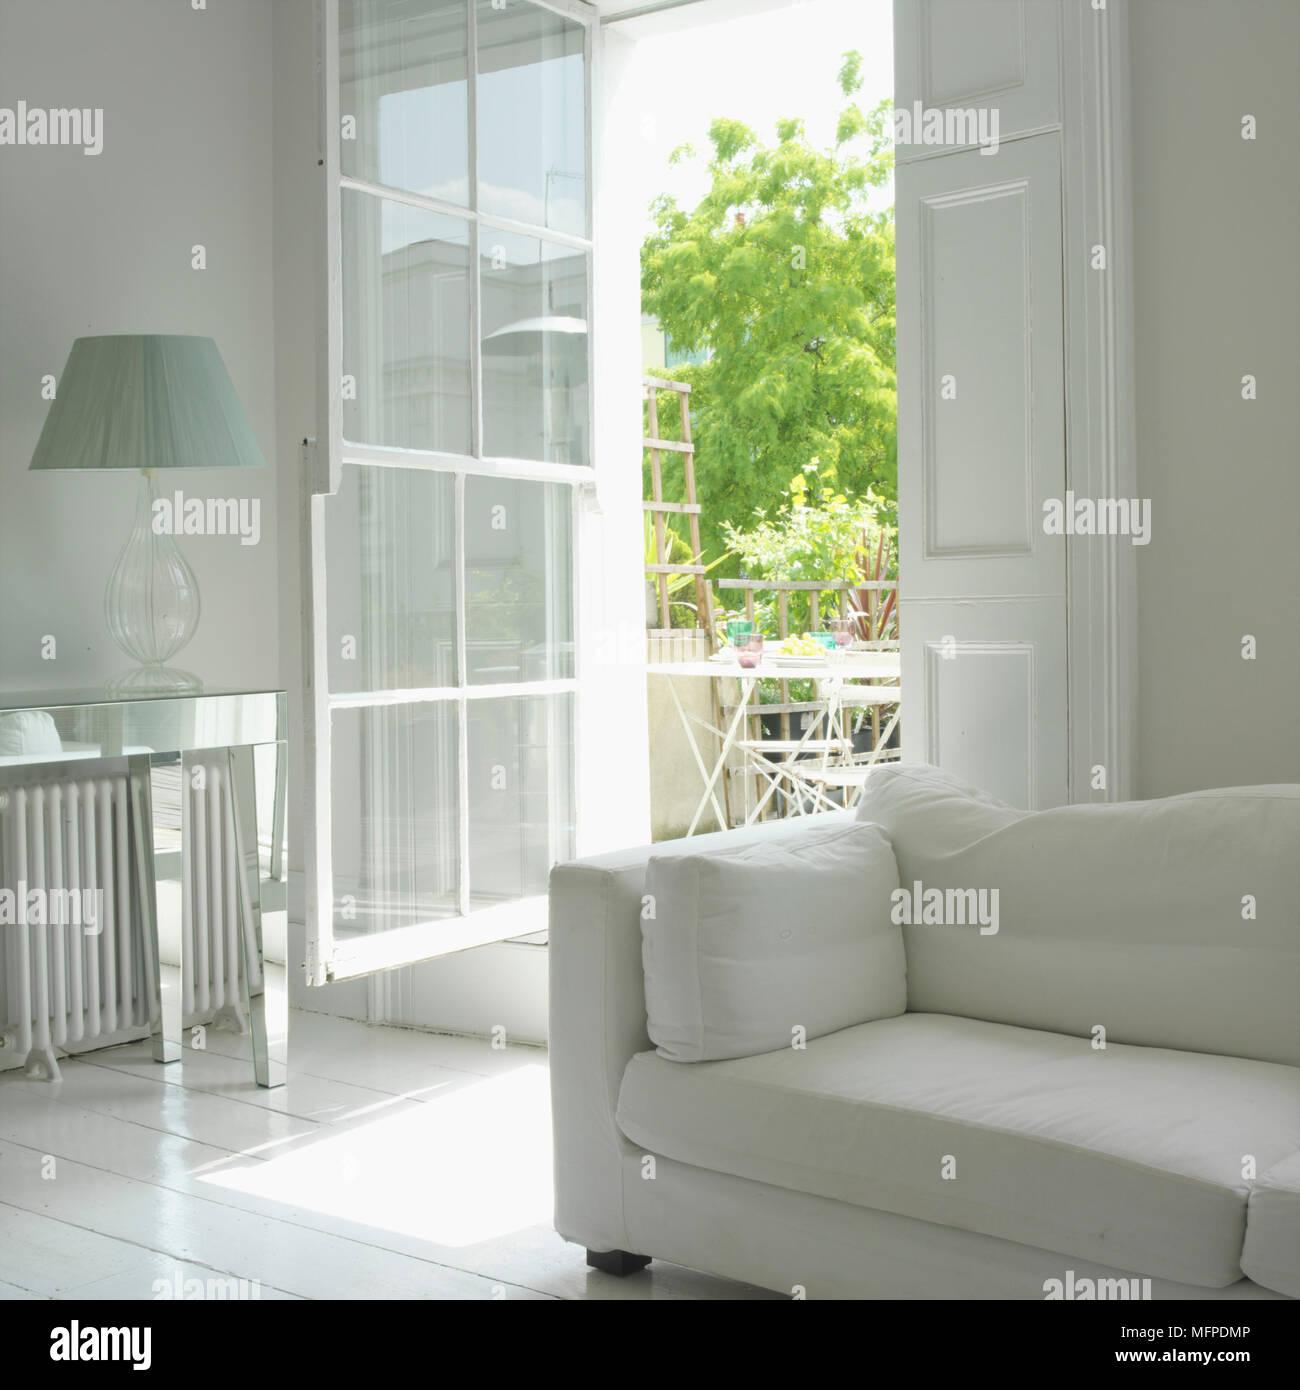 Salon De Terrasse Blanc | Banc De Jardin Fer Forge Blanc ...